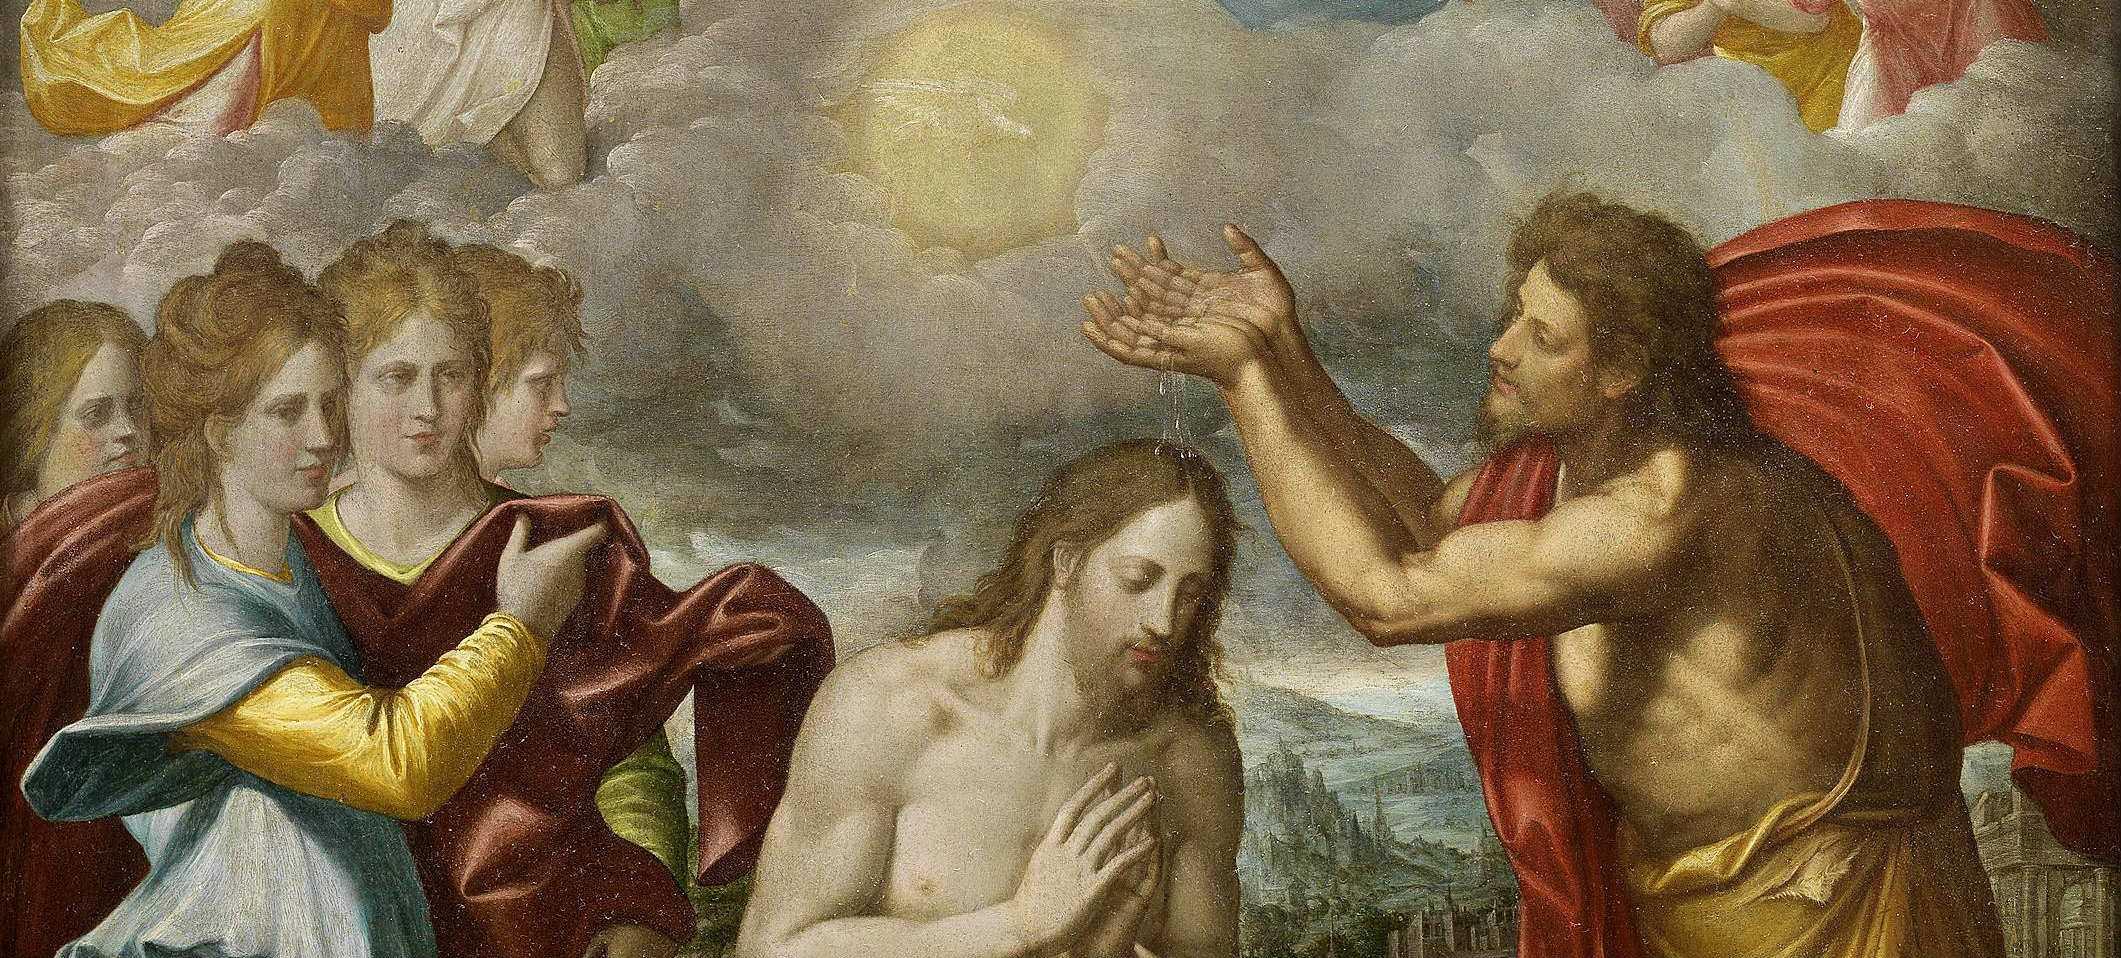 Gaudete Sunday – Advent Joy & John the Baptist